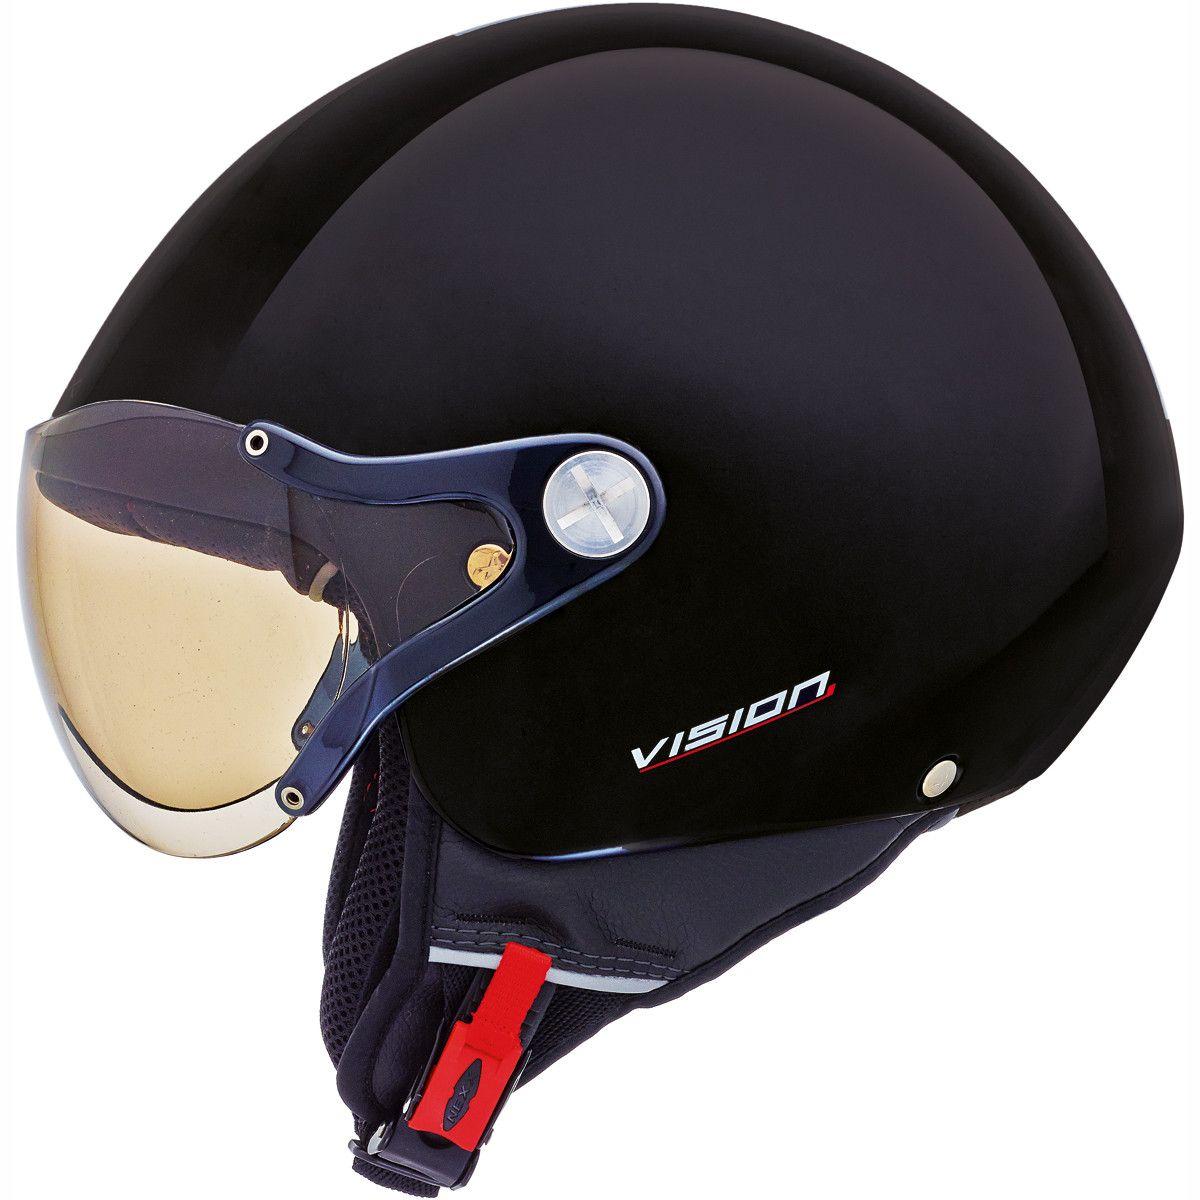 af6b7973 Nexx X60 Vision Plus Helmet in Black - Stylish, lightweight, composite  fibre, urban helmet with internal sun visor from #Nexx.